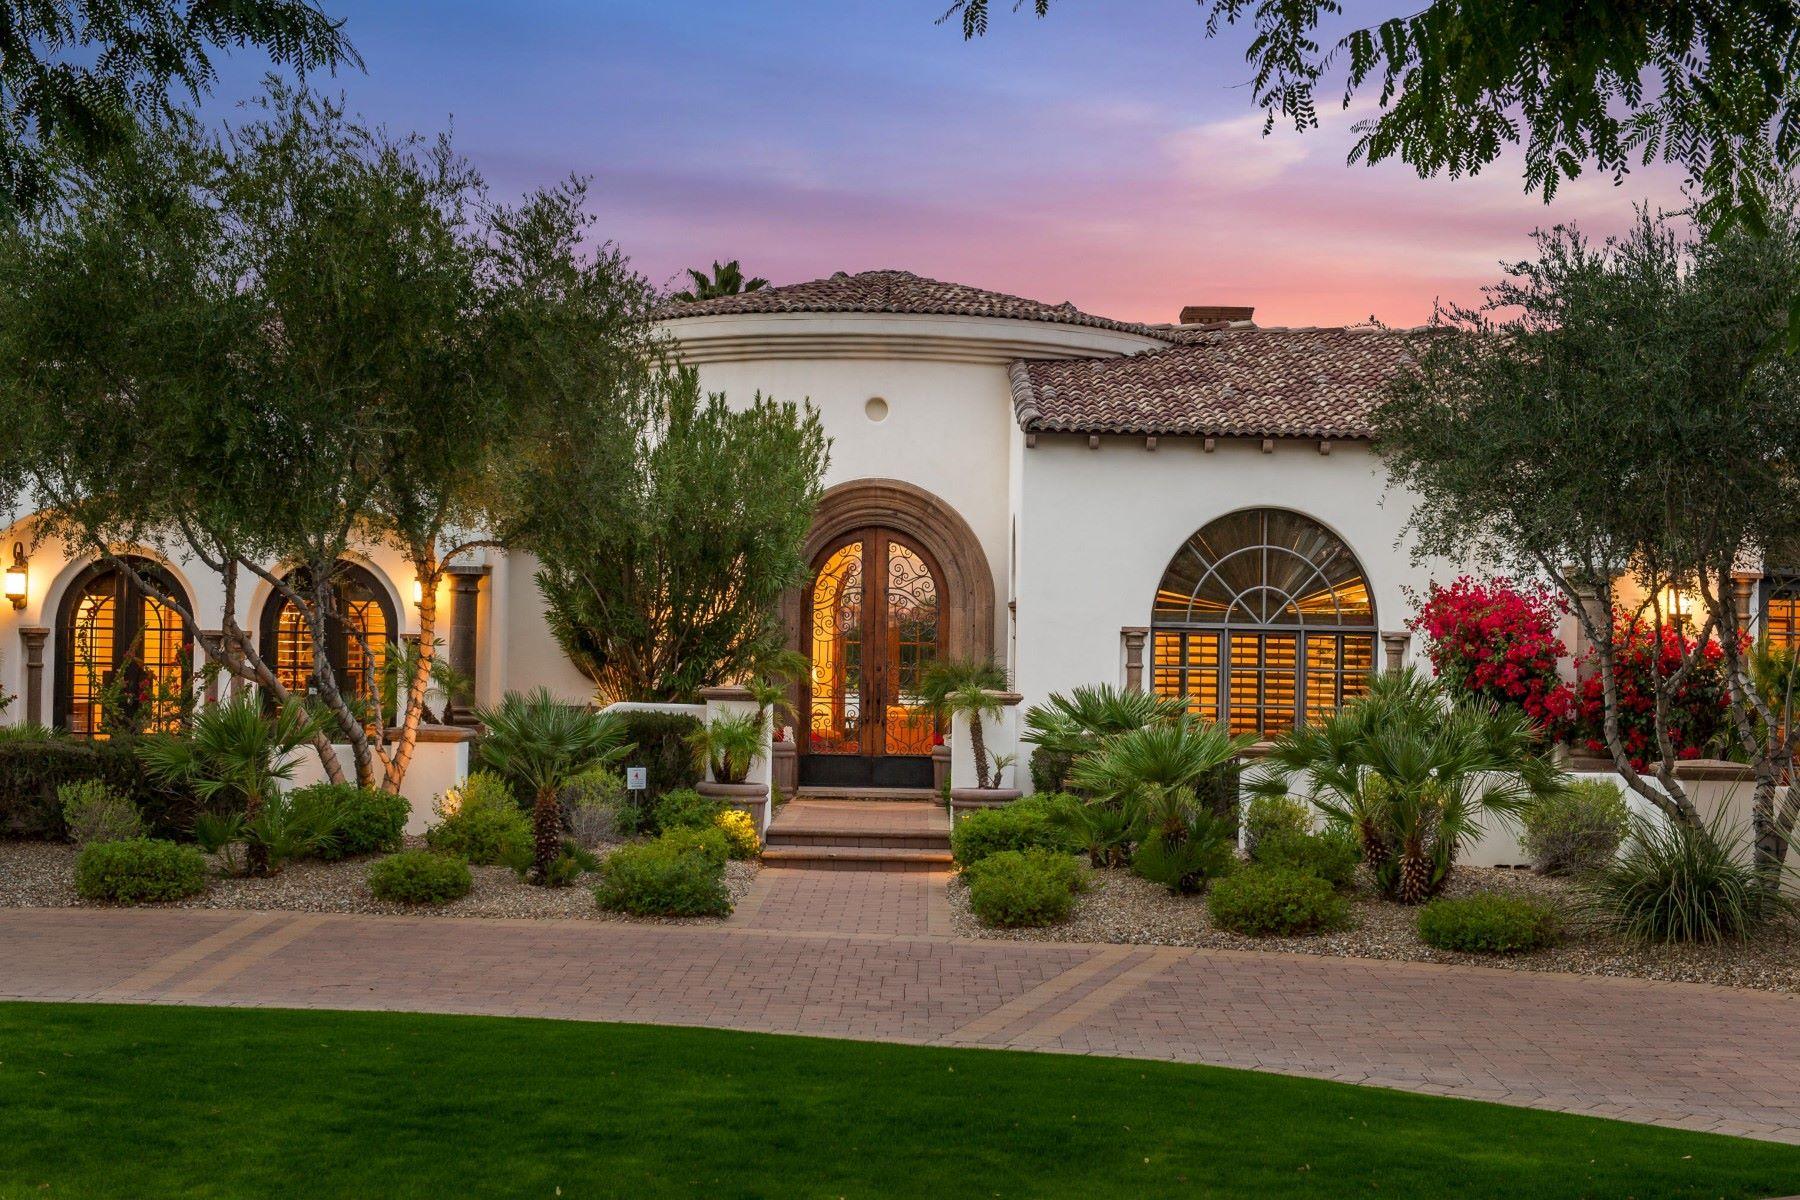 Single Family Home for Sale at Timeless Santa Barbara masterpiece 6770 E Bluebird Ln Paradise Valley, Arizona, 85253 United States